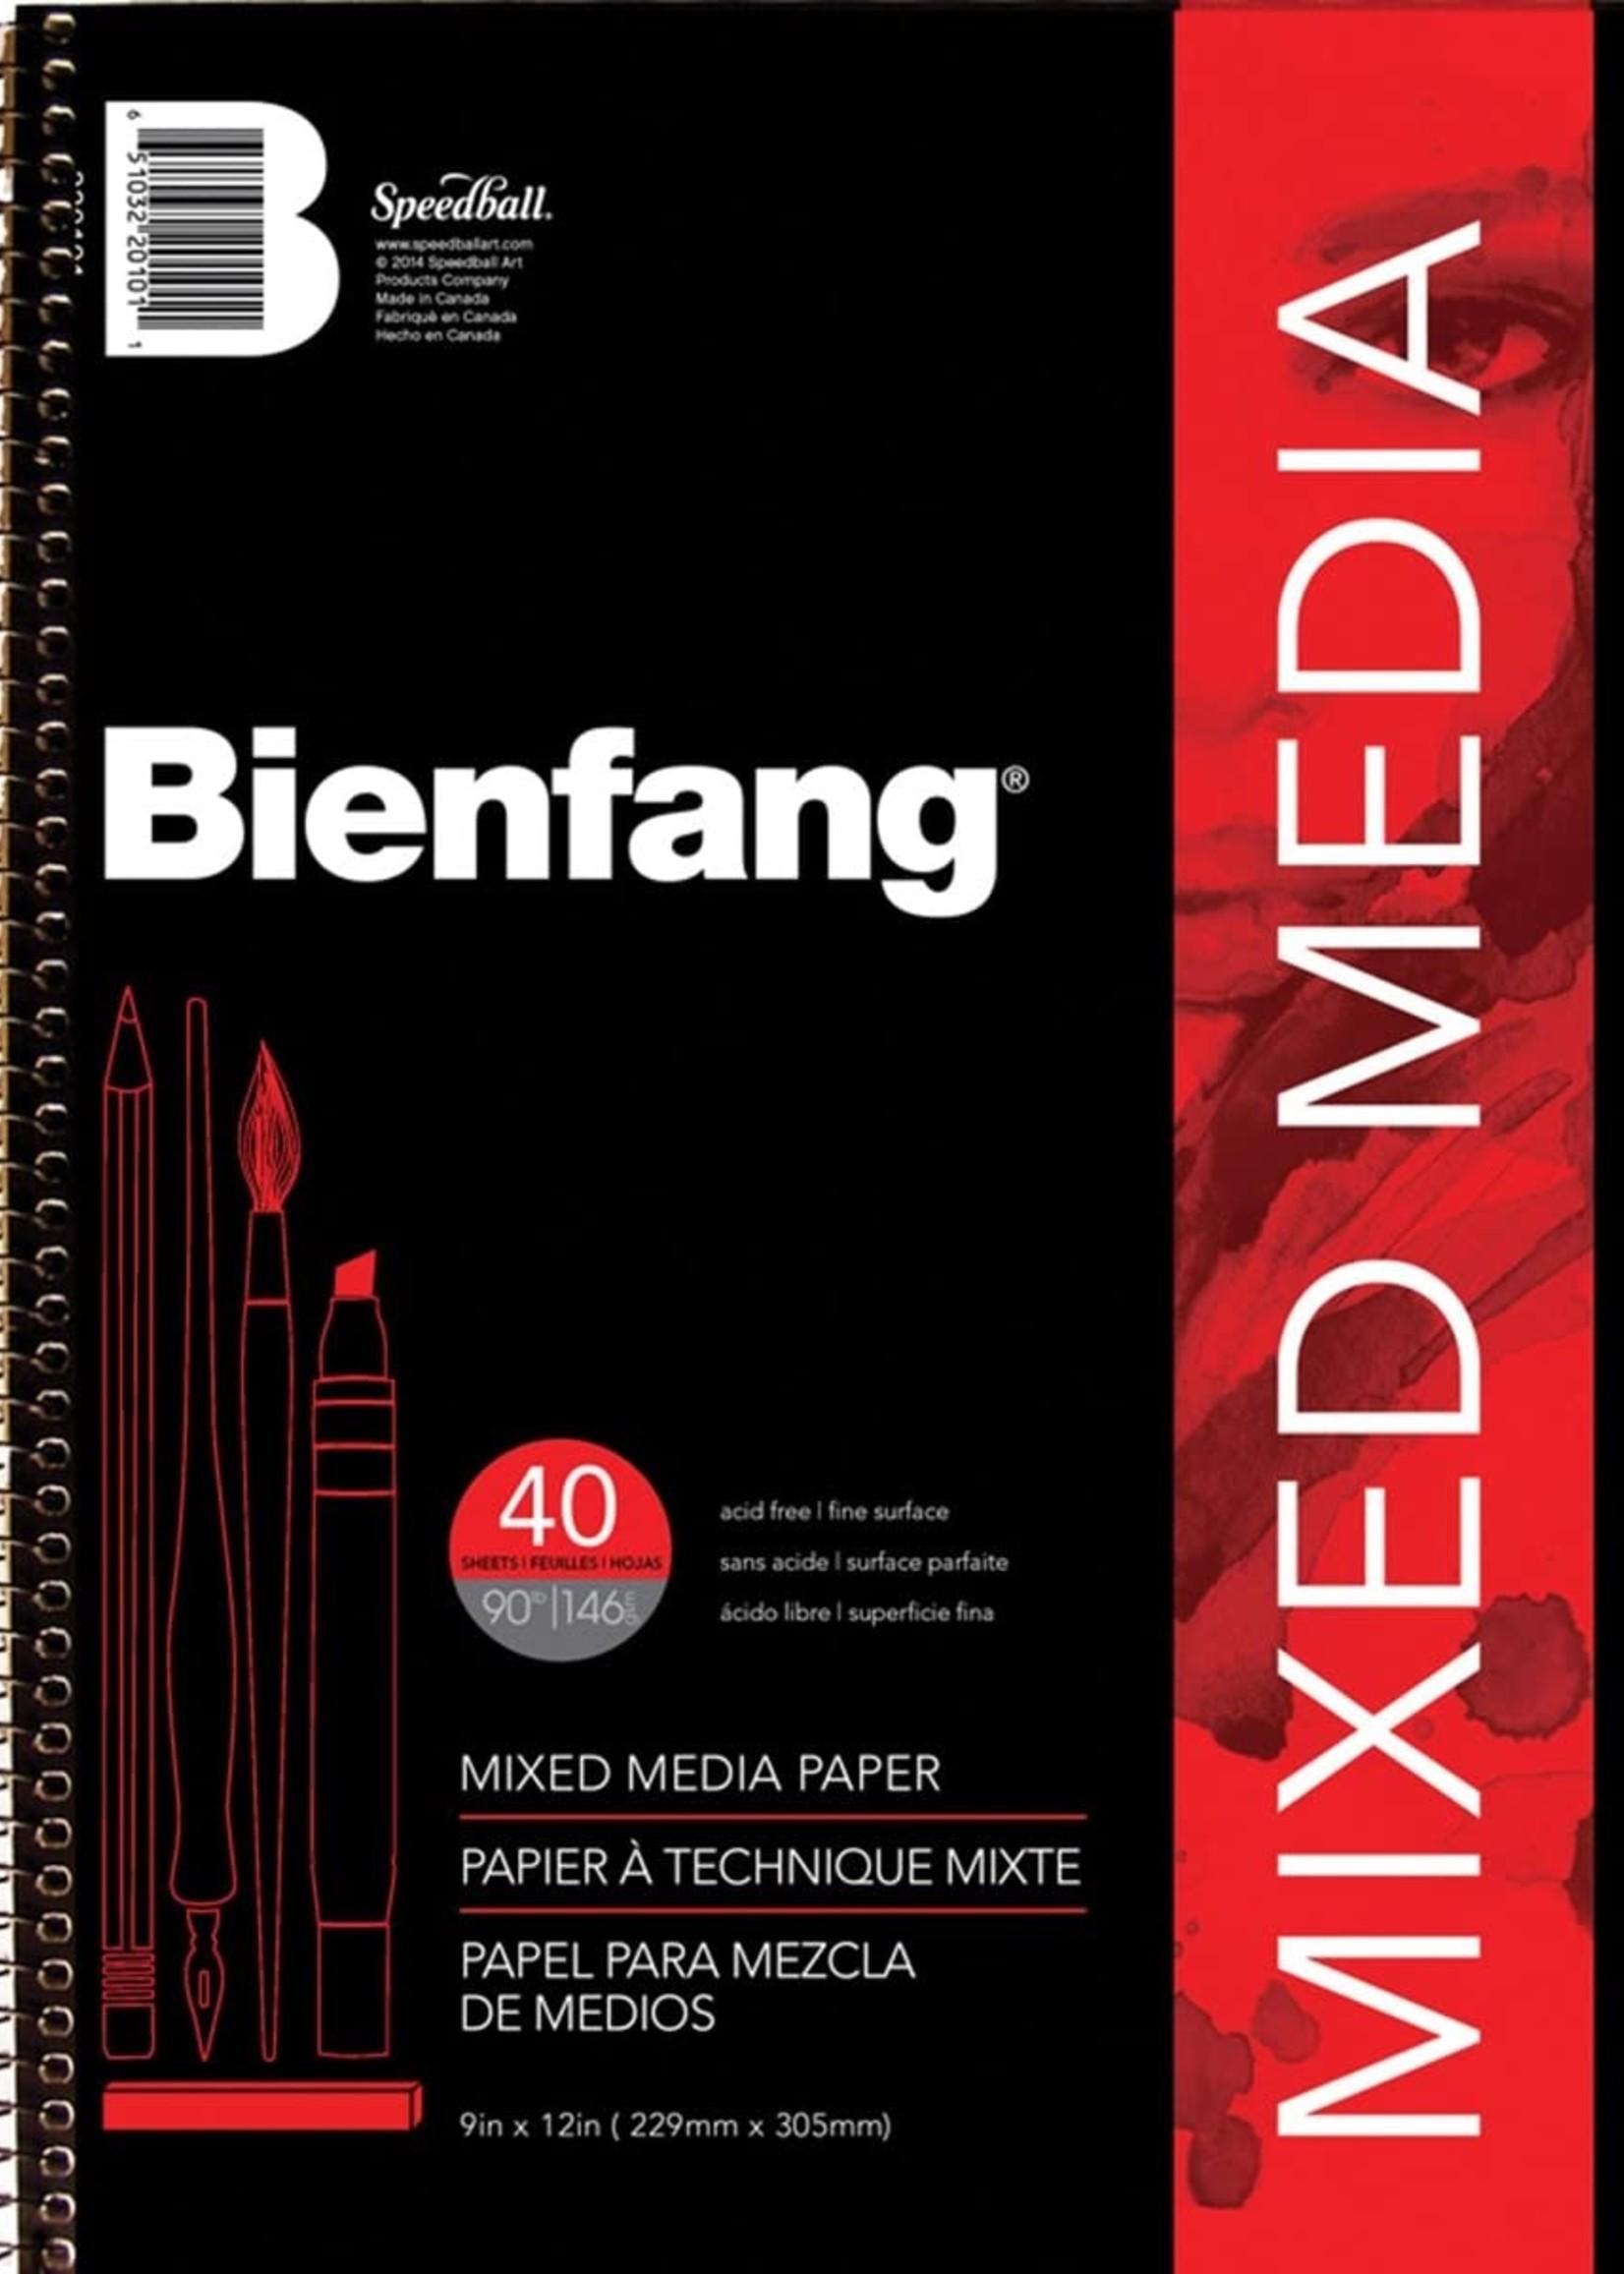 SPEEDBALL ART PRODUCTS BIENFANG MIXED MEDIA SKETCHBOOKS